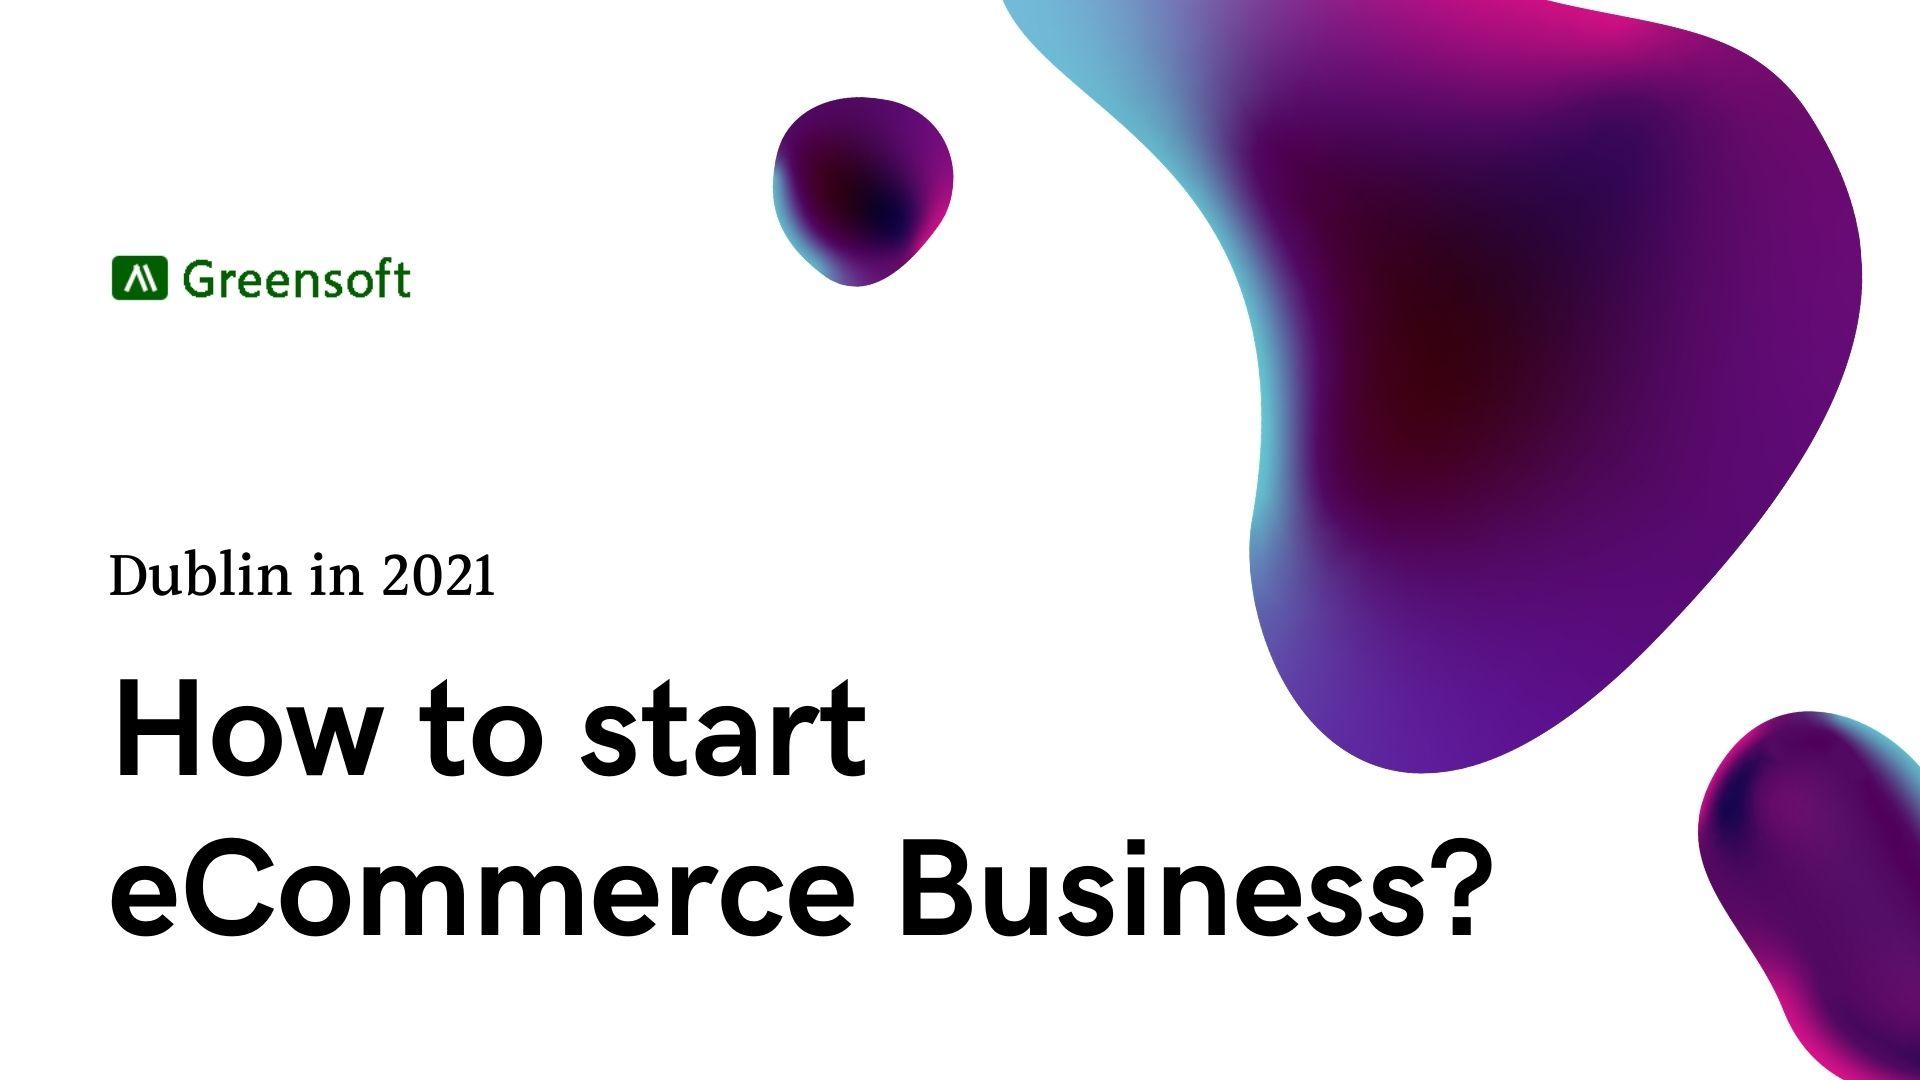 eCommerce Business in dublin